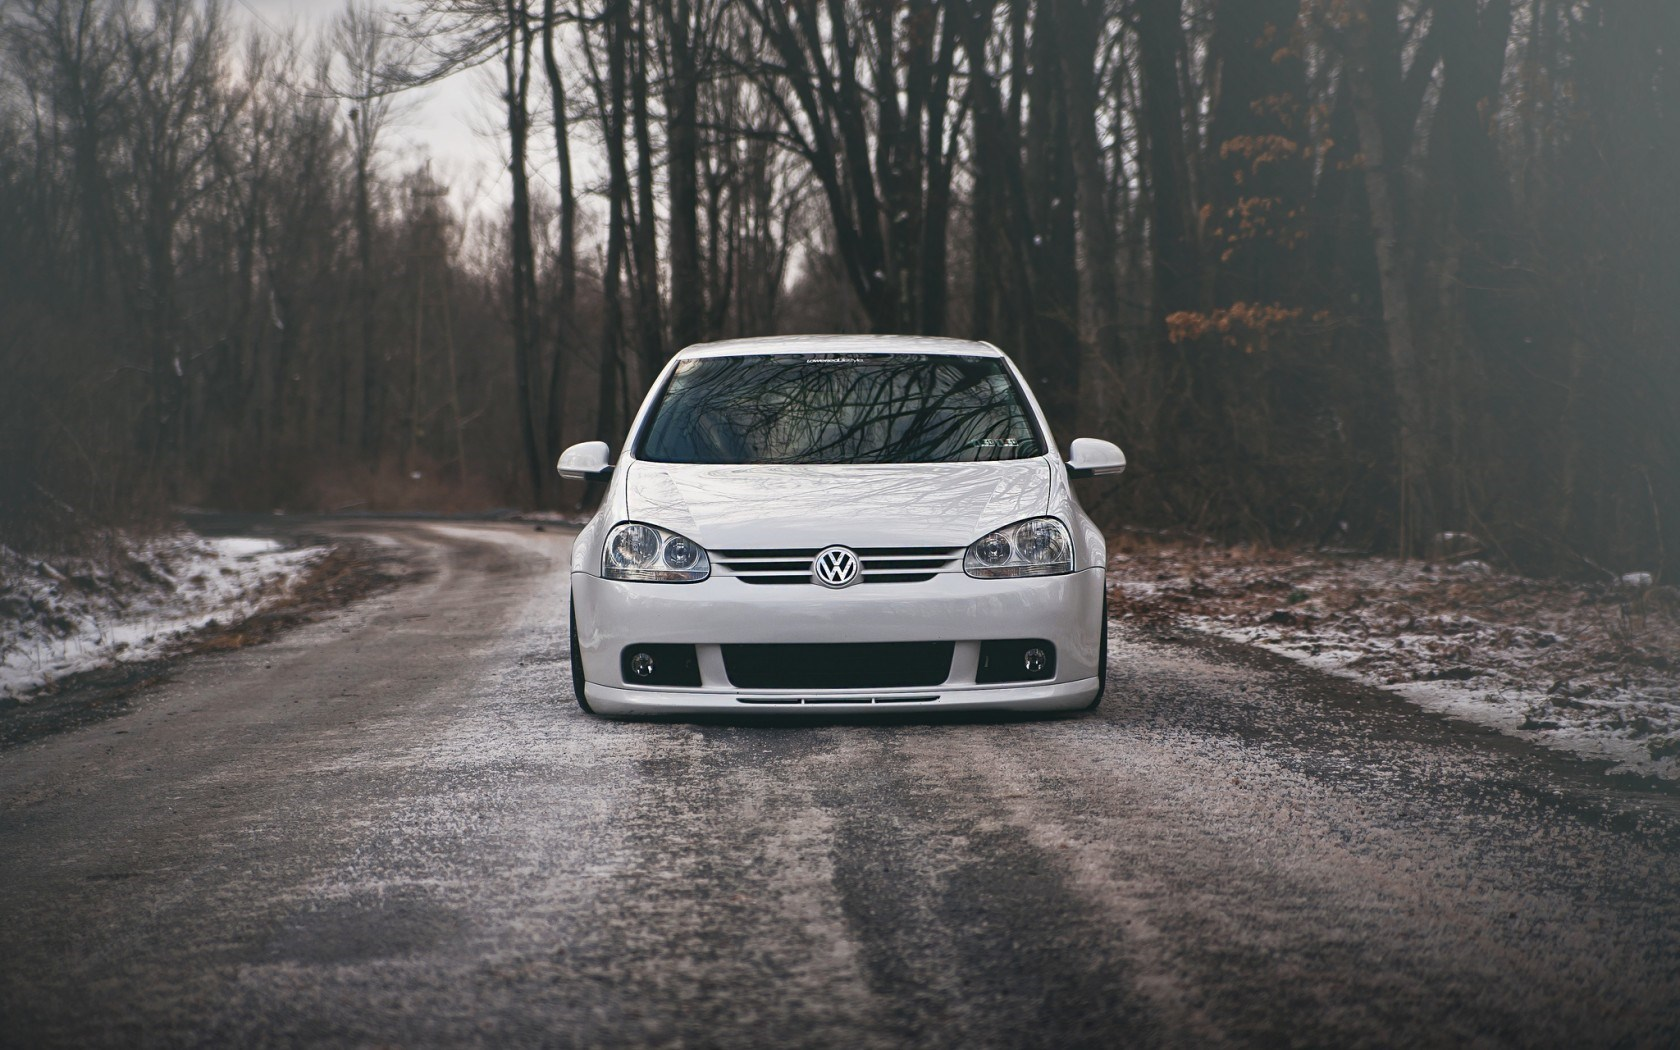 Volkswagen Golf GTI Car White Tuning Winter Snow